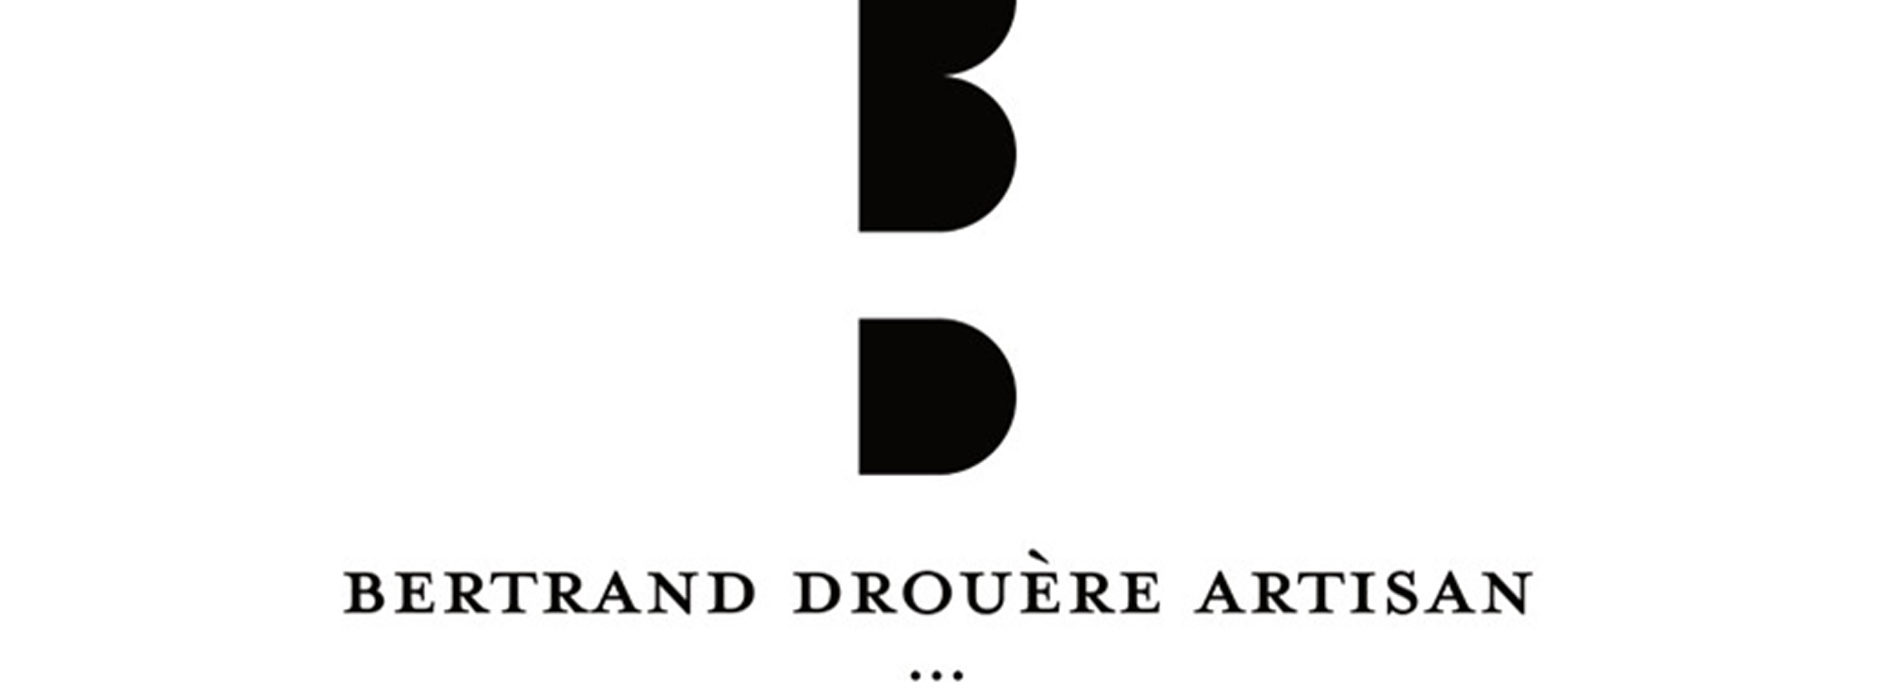 Bertrand Drouère Artisan Batîment Slide1